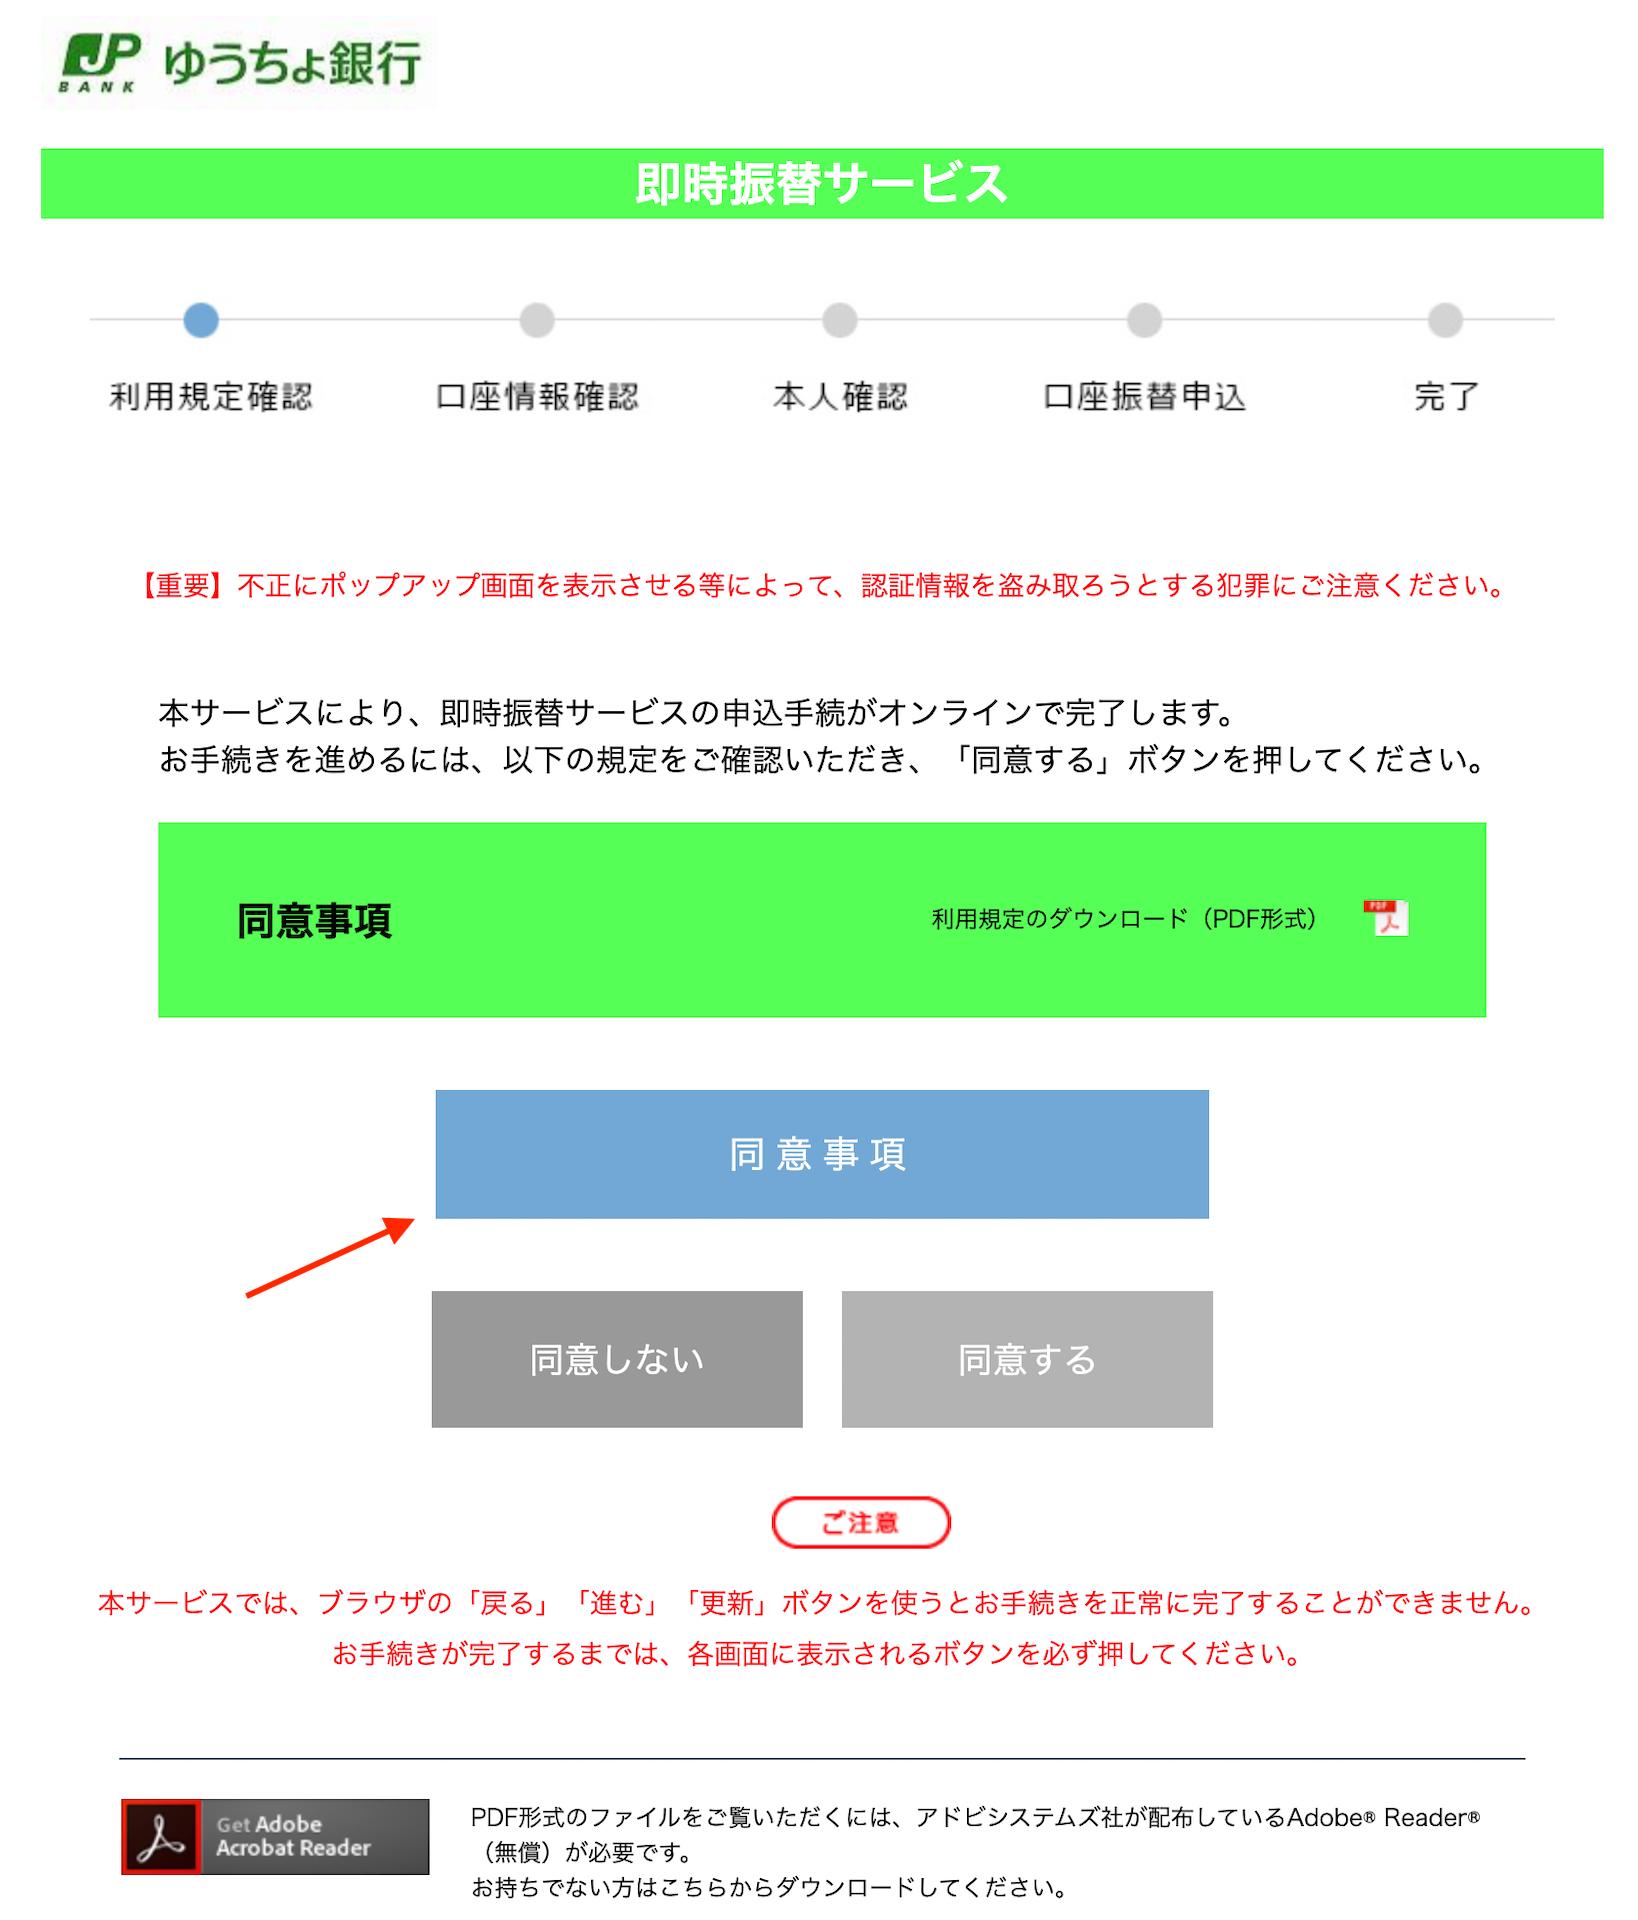 PayPal ゆうちょ銀行 同意事項